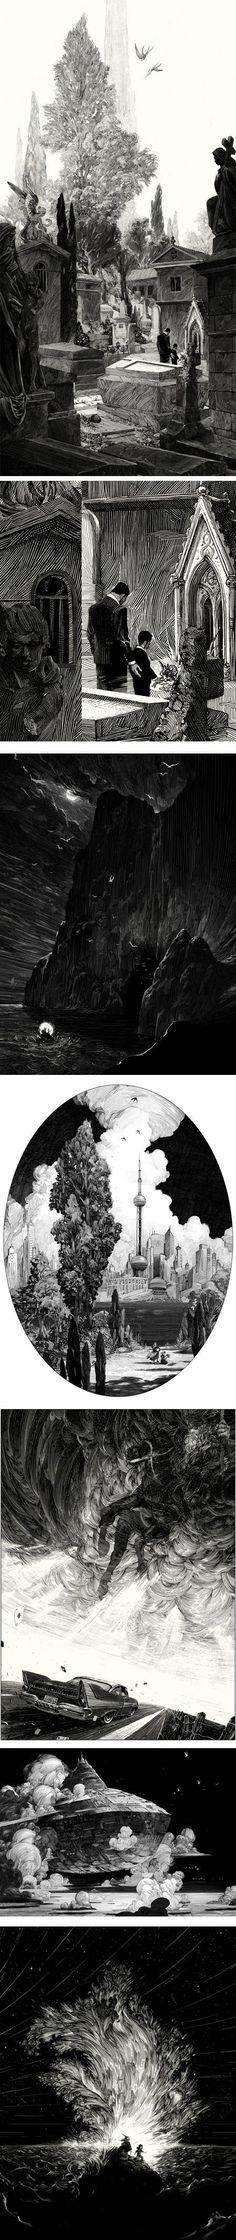 Nicolas Delort, a freelance illustrator based in Paris, creates wonderfully textural pen & ink (on scratchboard) illustrations: